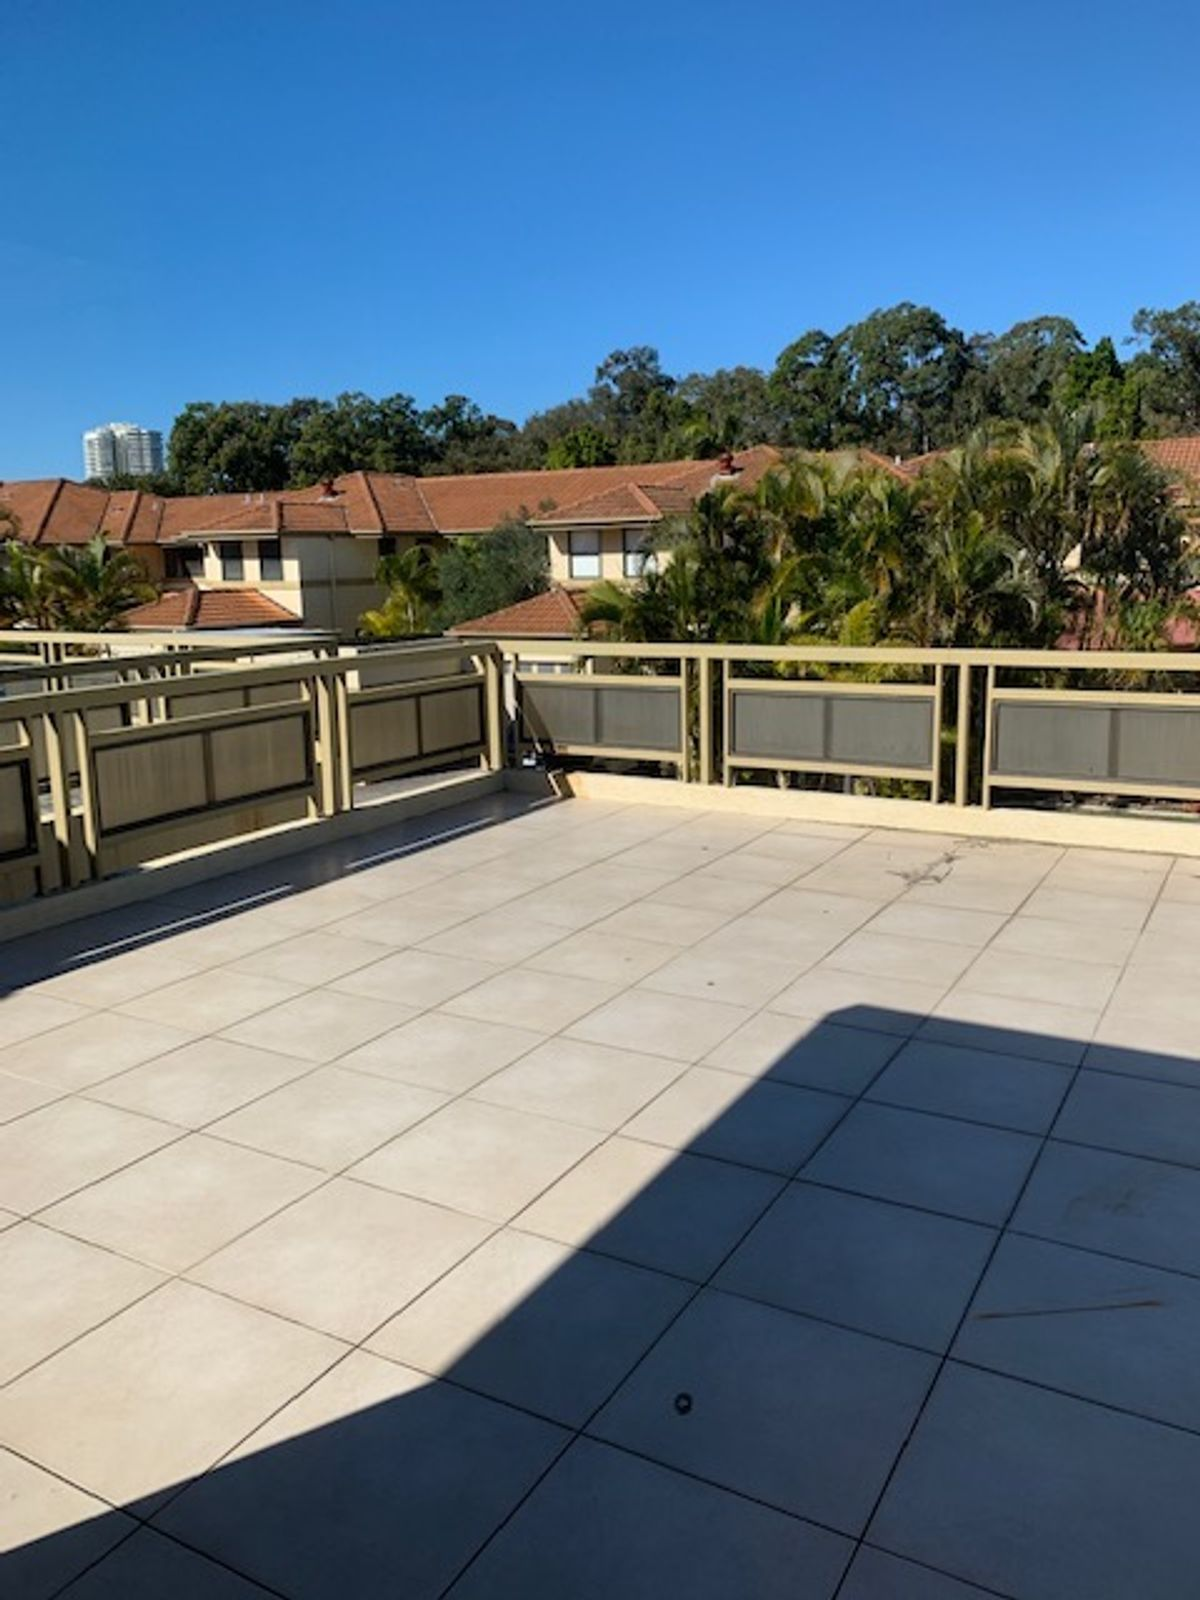 56/100 Morala Avenue, Runaway Bay, QLD 4216